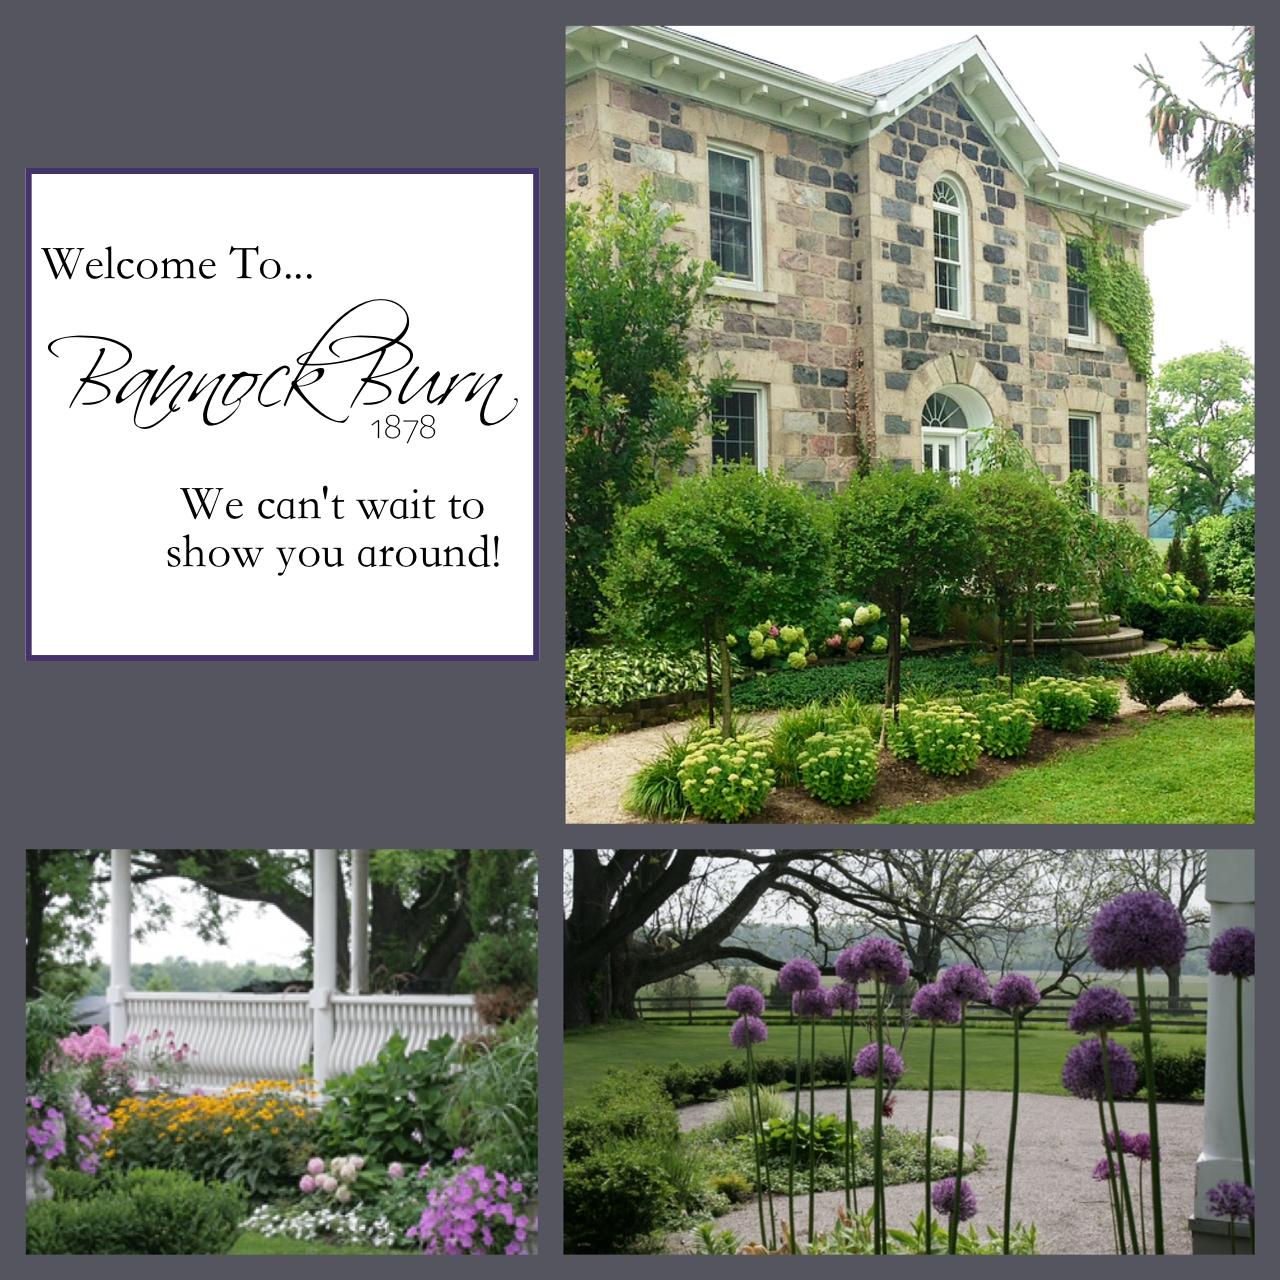 Welcome to BannockBurn… CynthiaWeber.com